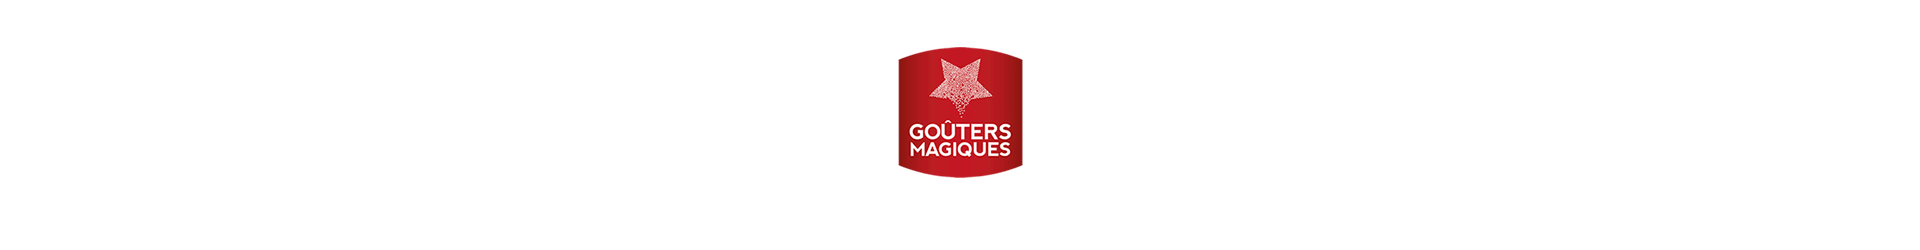 Magic Gouters